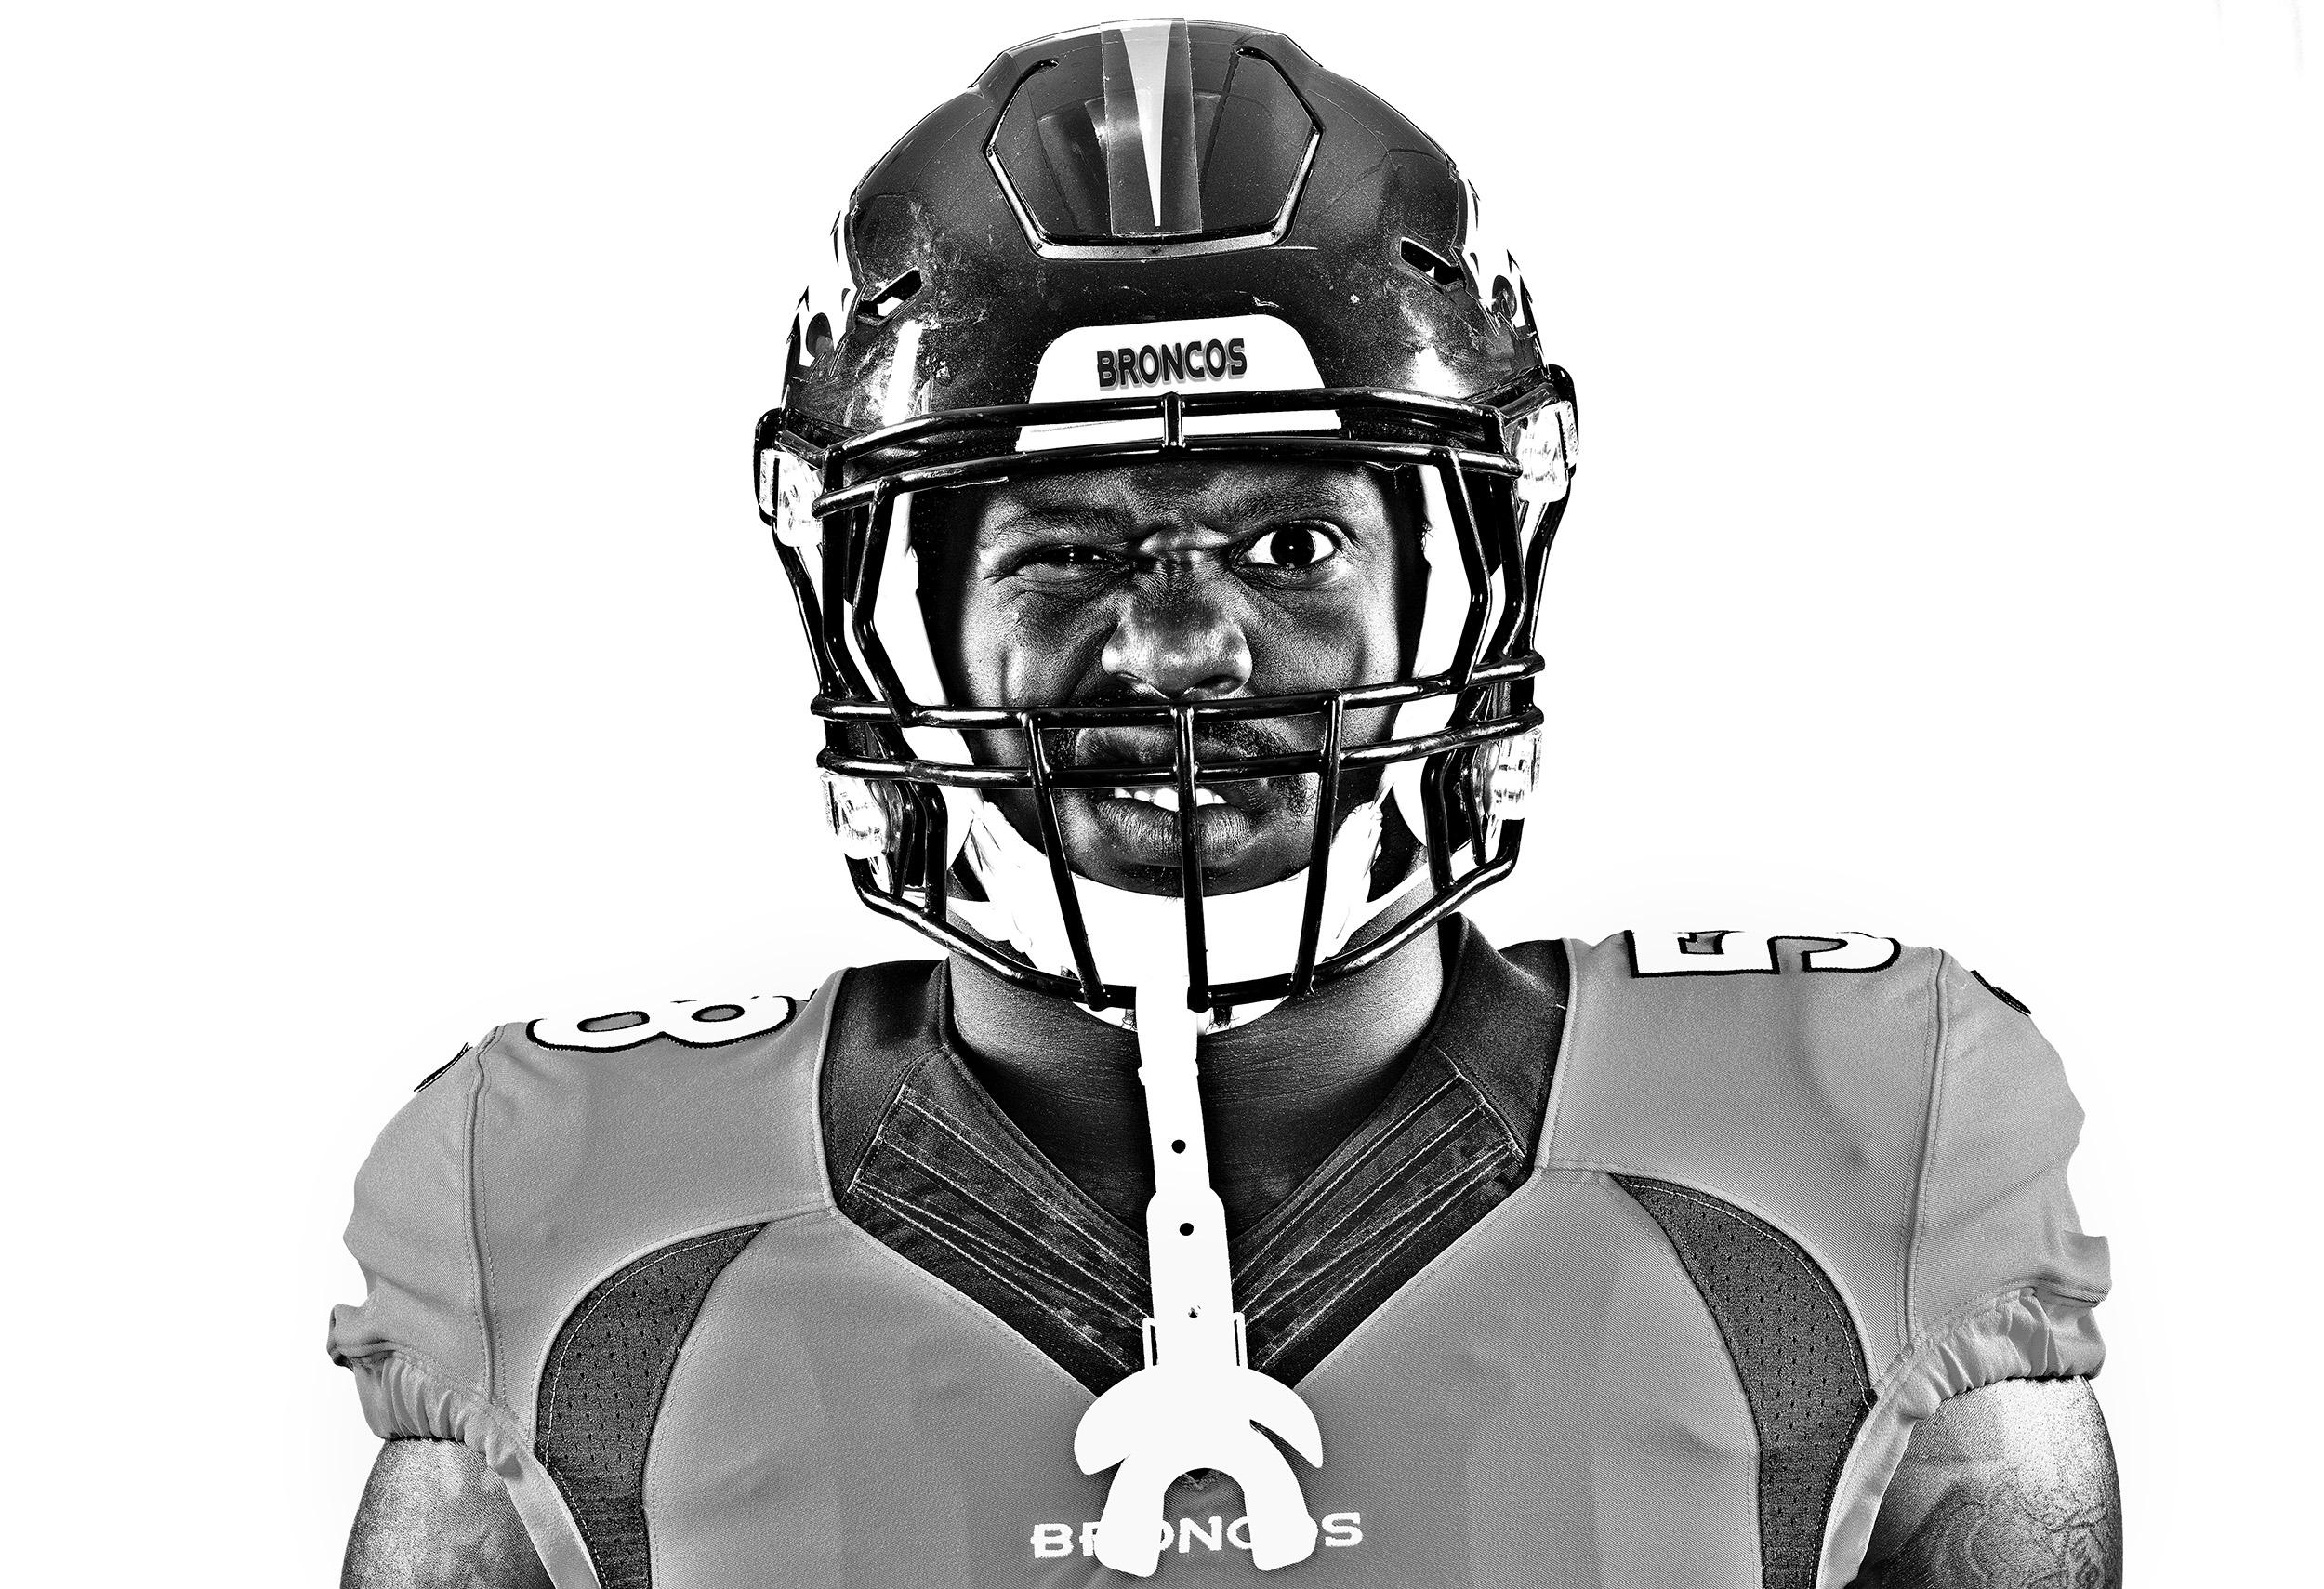 Denver Broncos linebacker Von Miller stands for a portrait on August 16, 2016. (Photo by Jamie Schwaberow for Sports Illustrated)